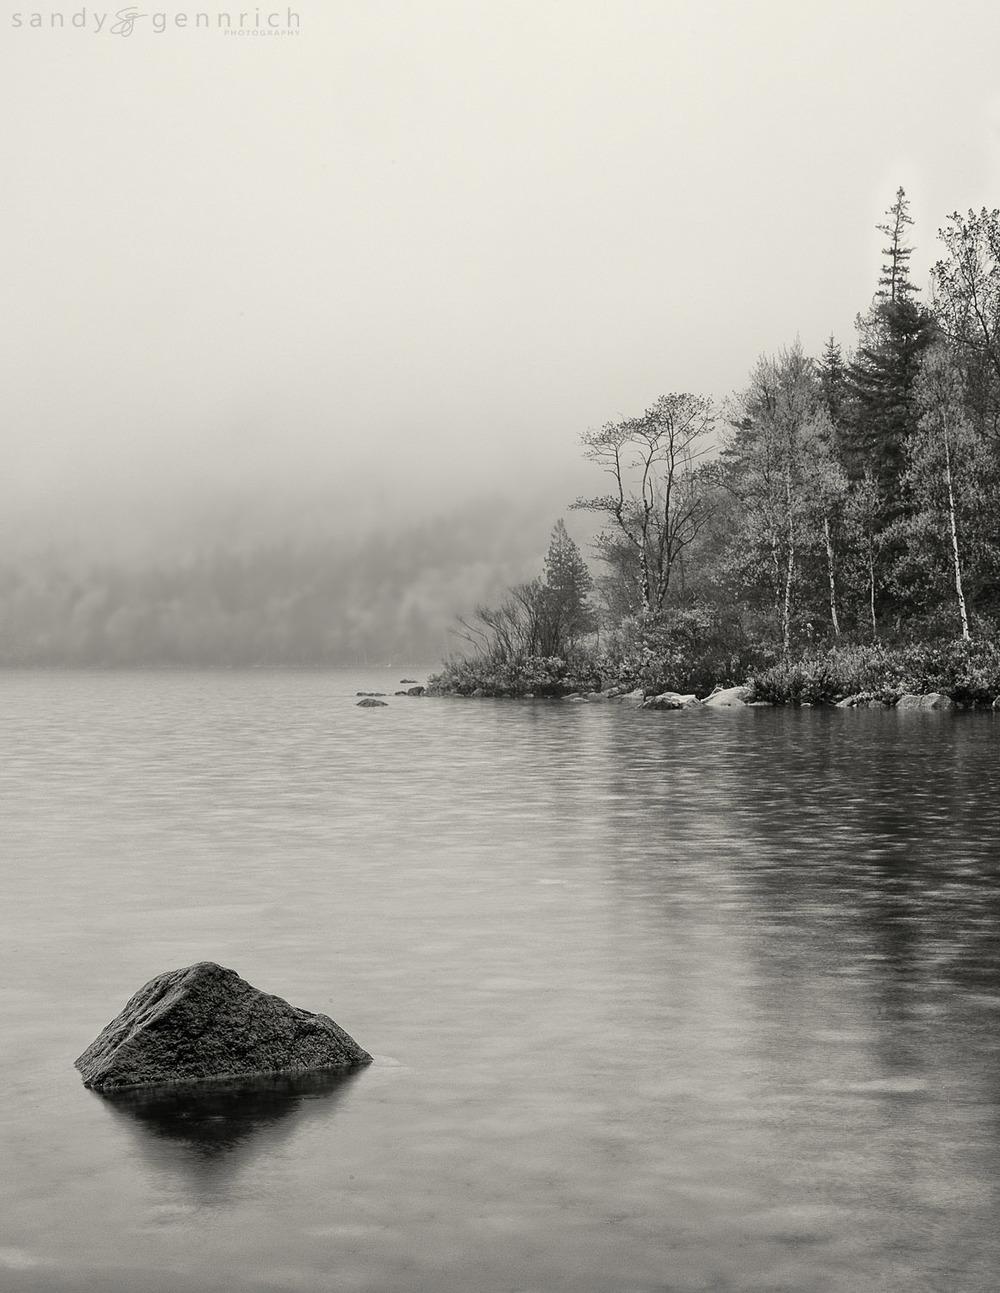 Counterpoint - Jordan Pond - Acadia National Park - Bar Harbor -